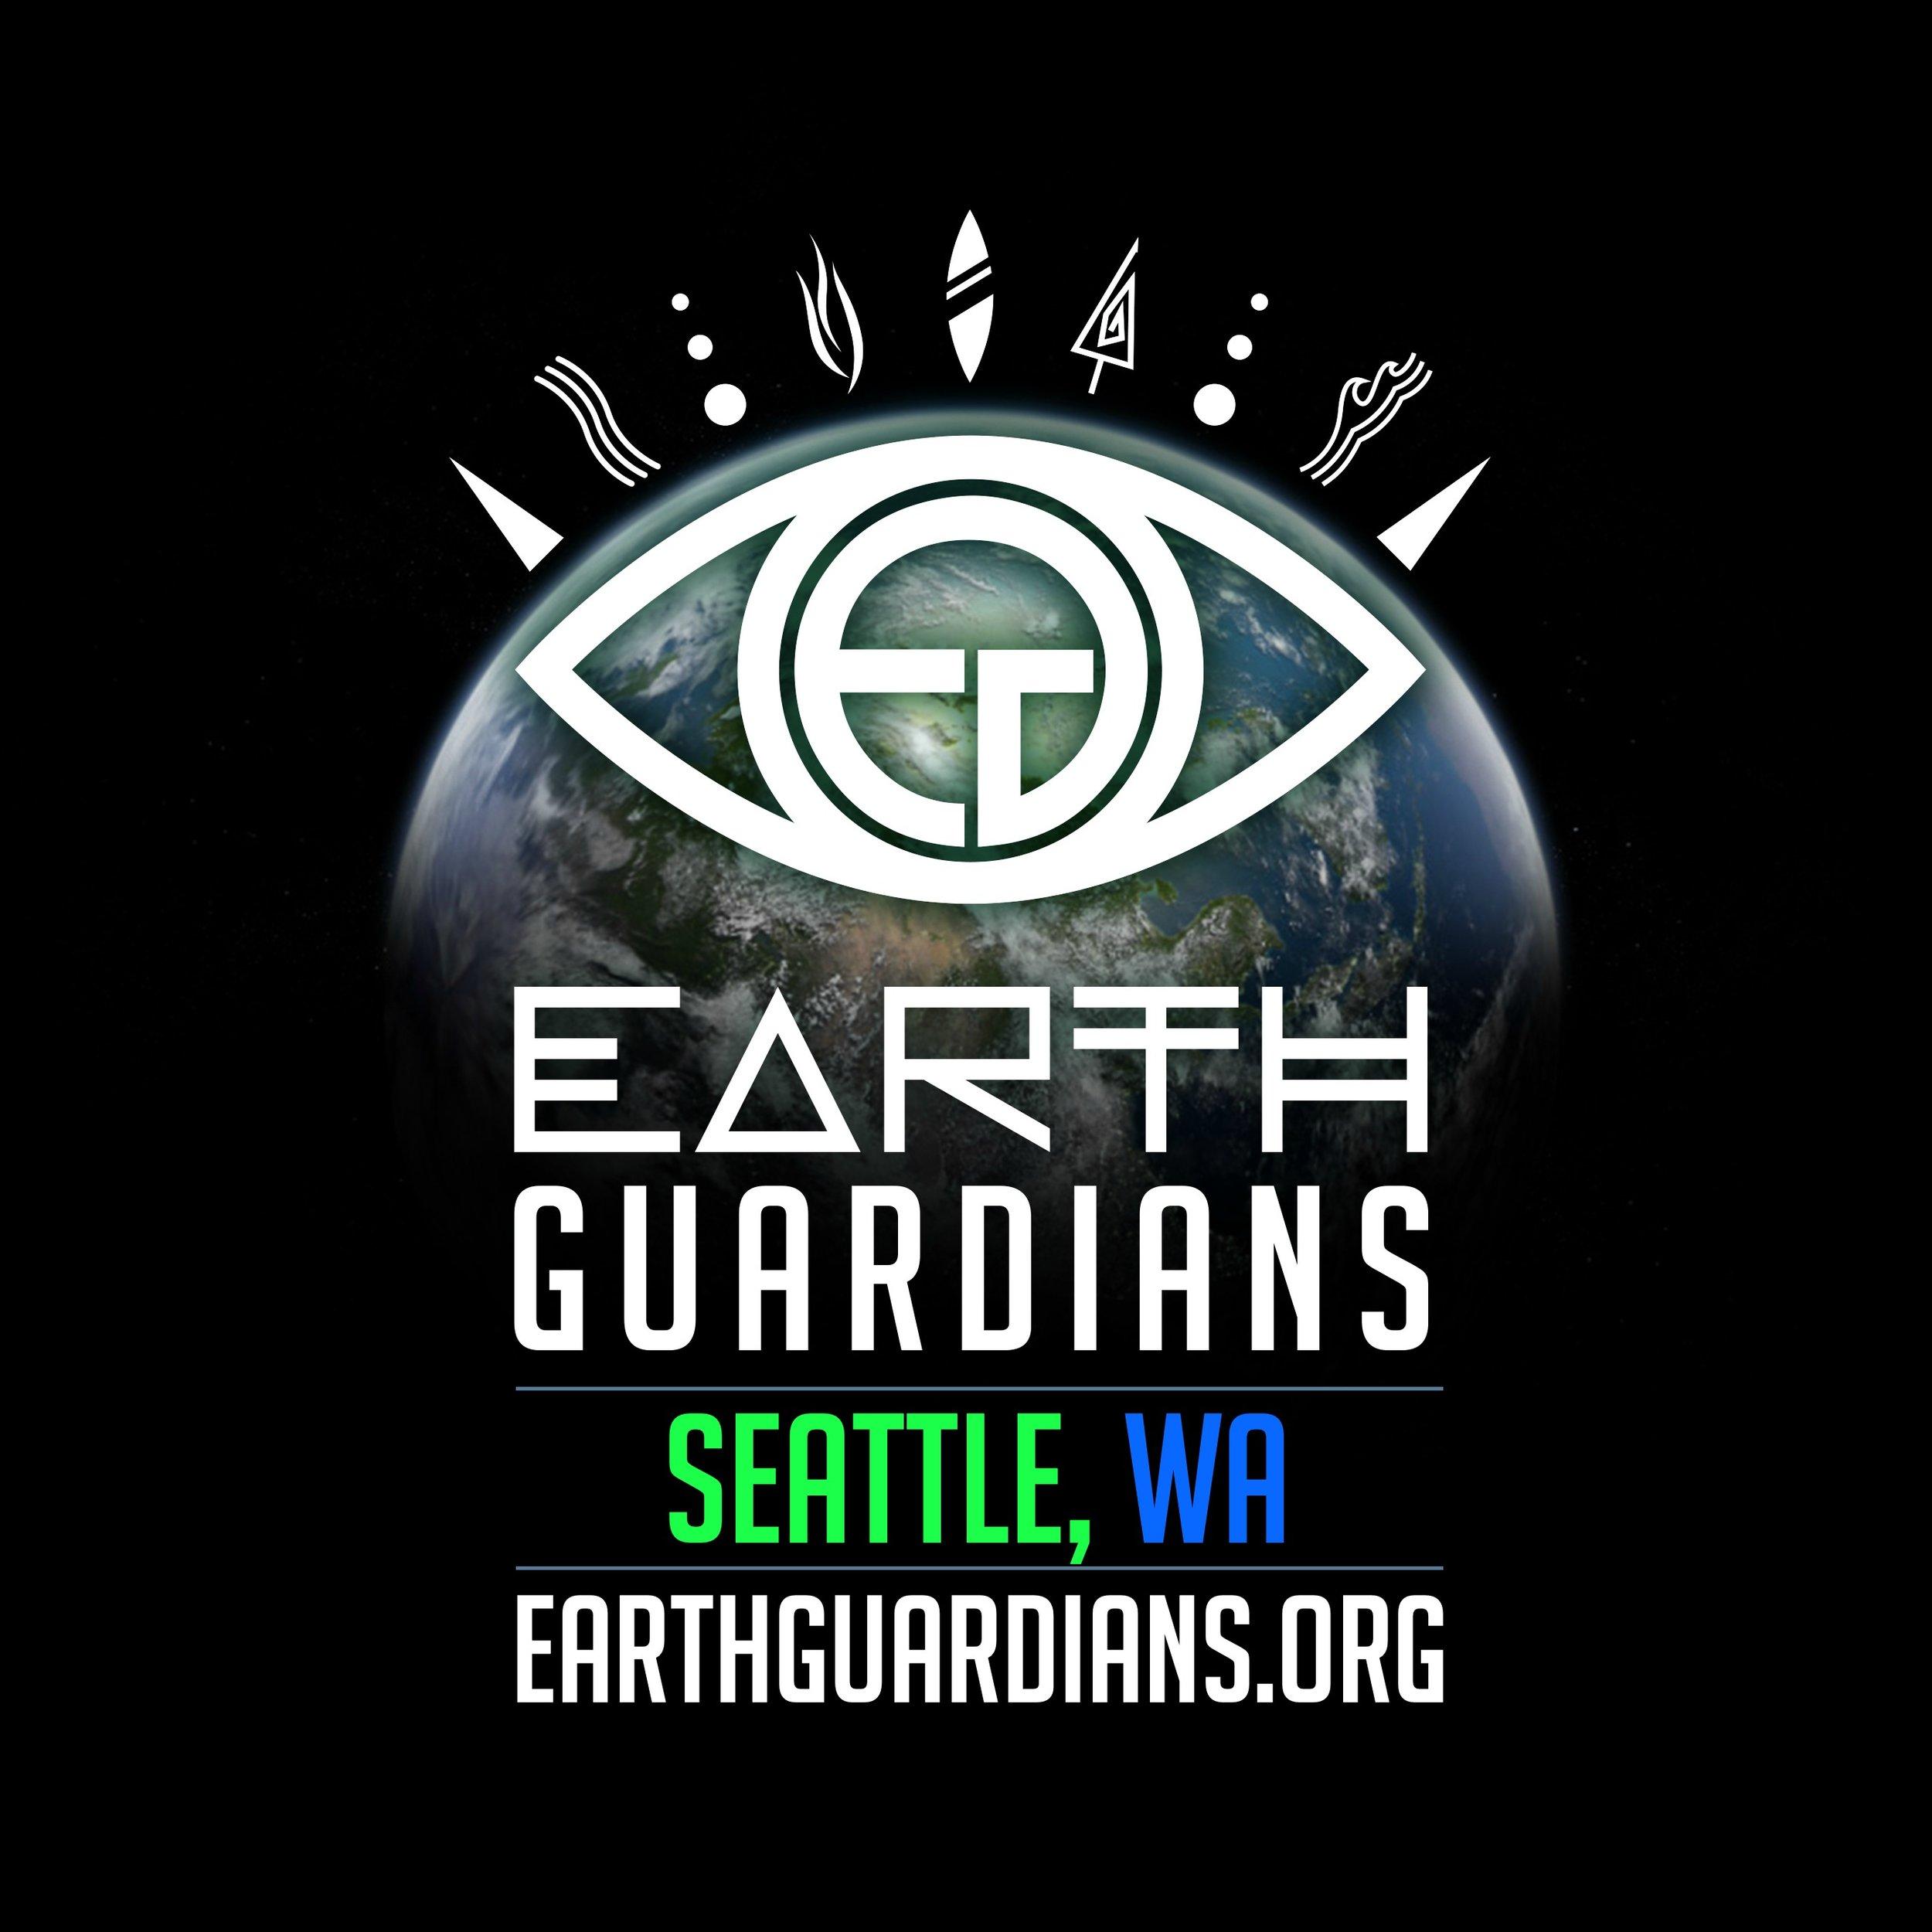 EG_crew logo SEATTLE.jpg